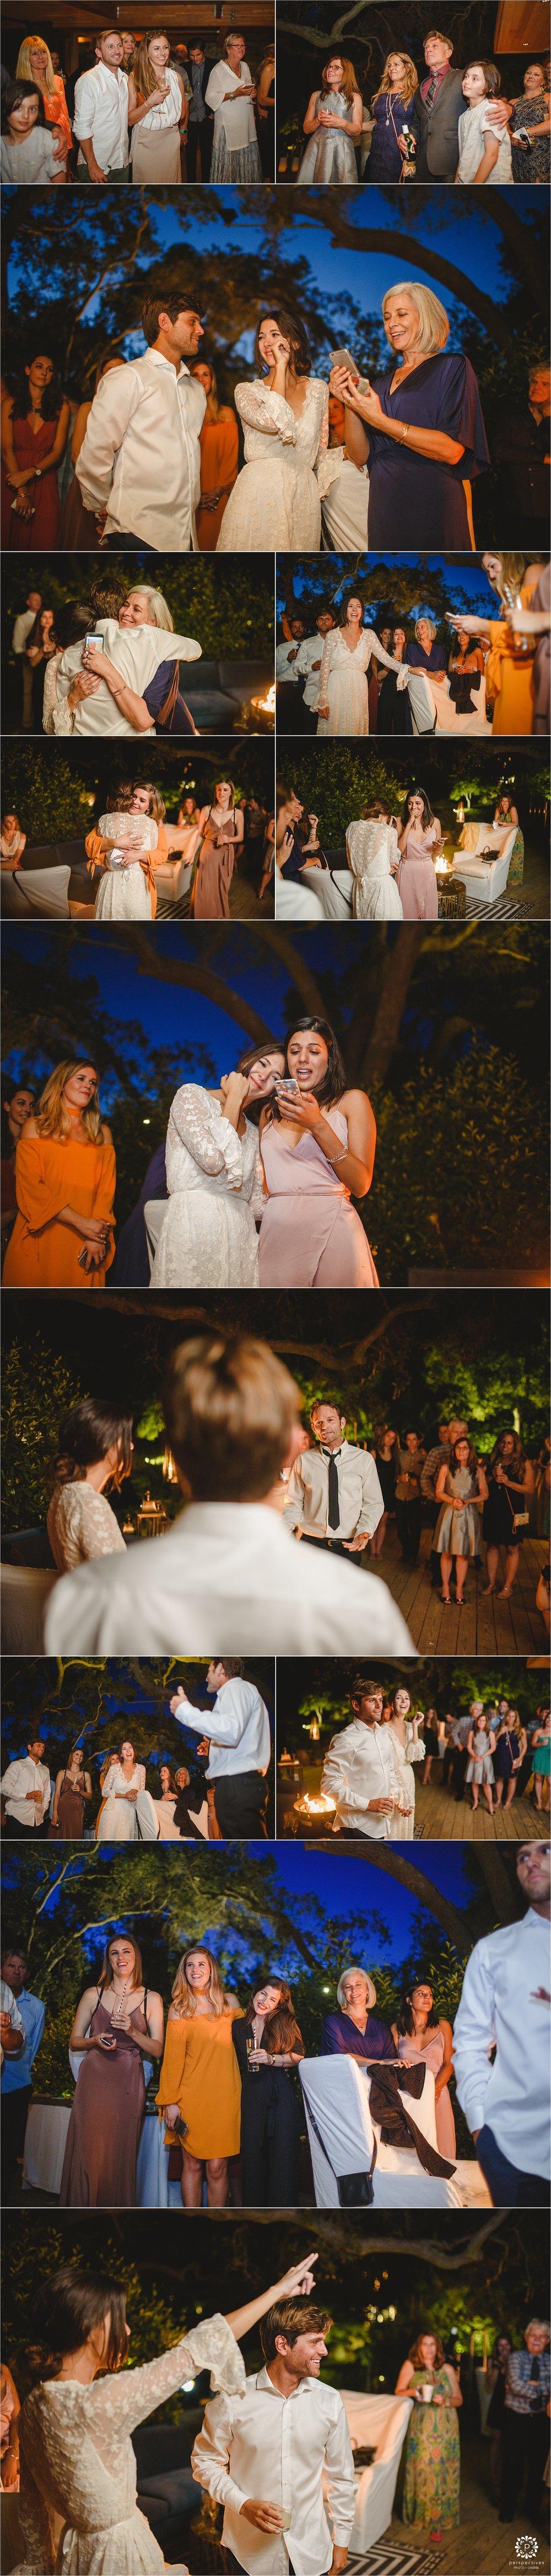 california_wedding_photographer_0108.jpg